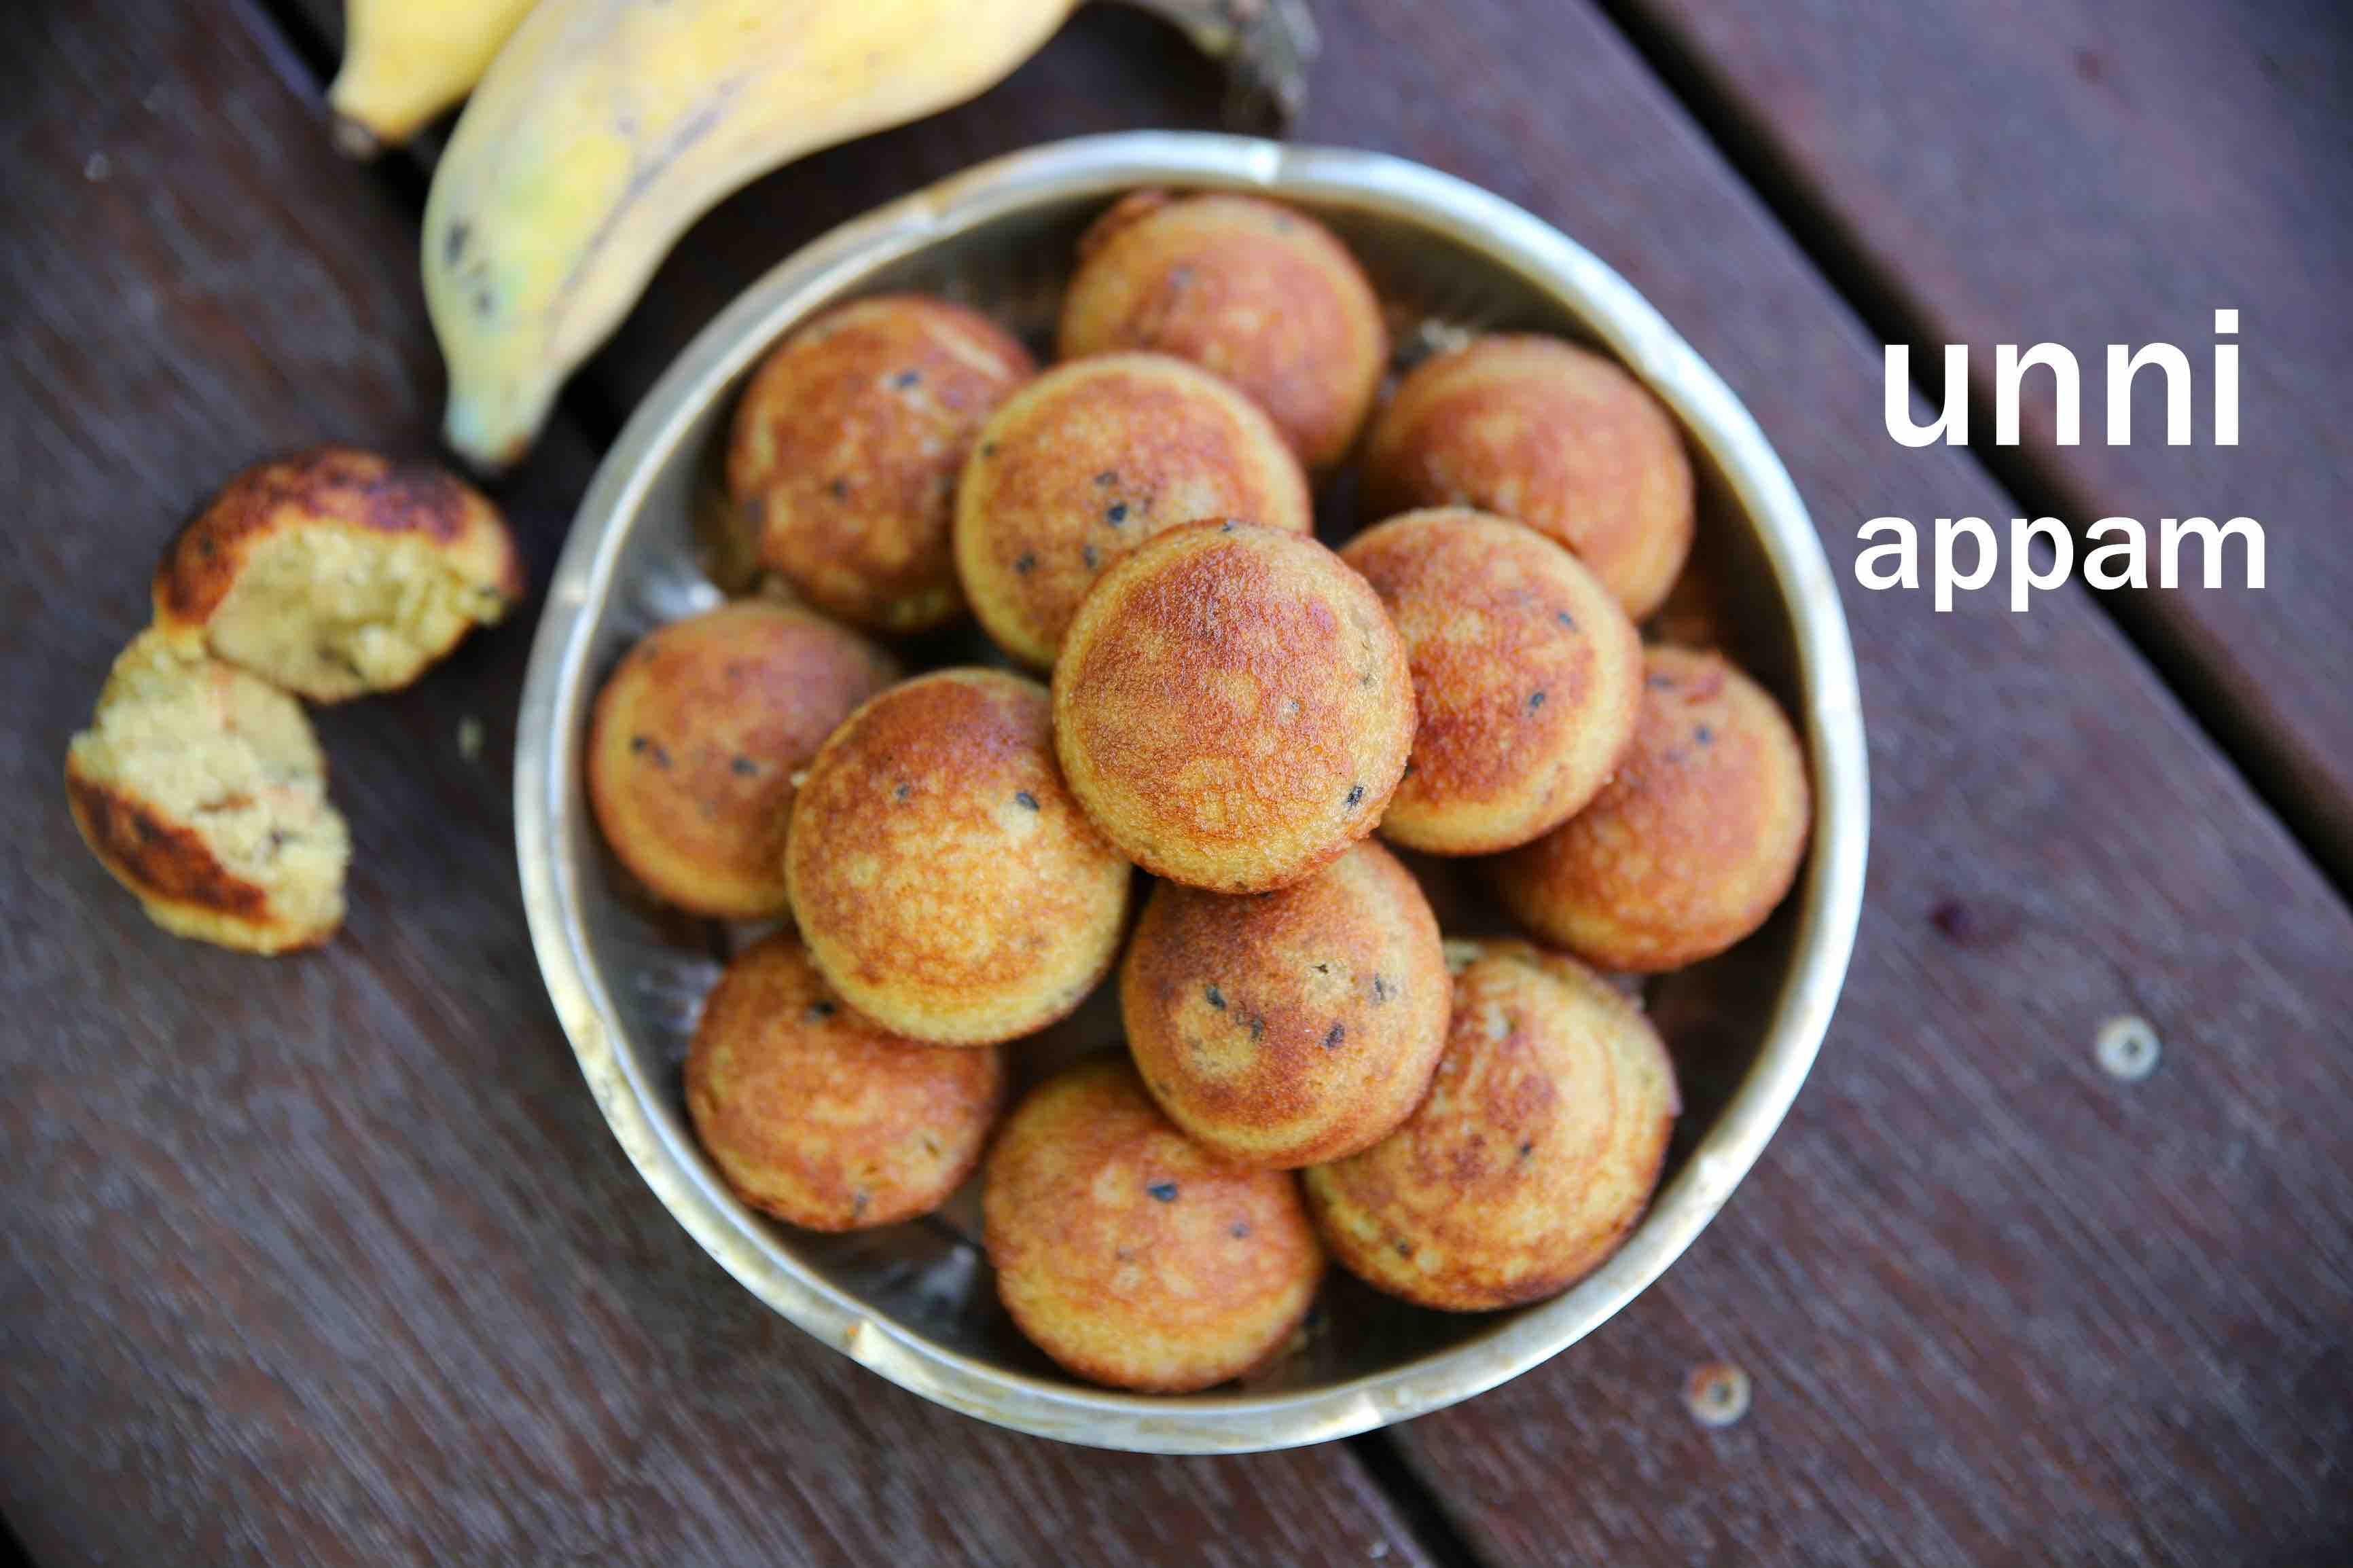 Pastry Cake Recipe In Malayalam: Unniyappam Recipe